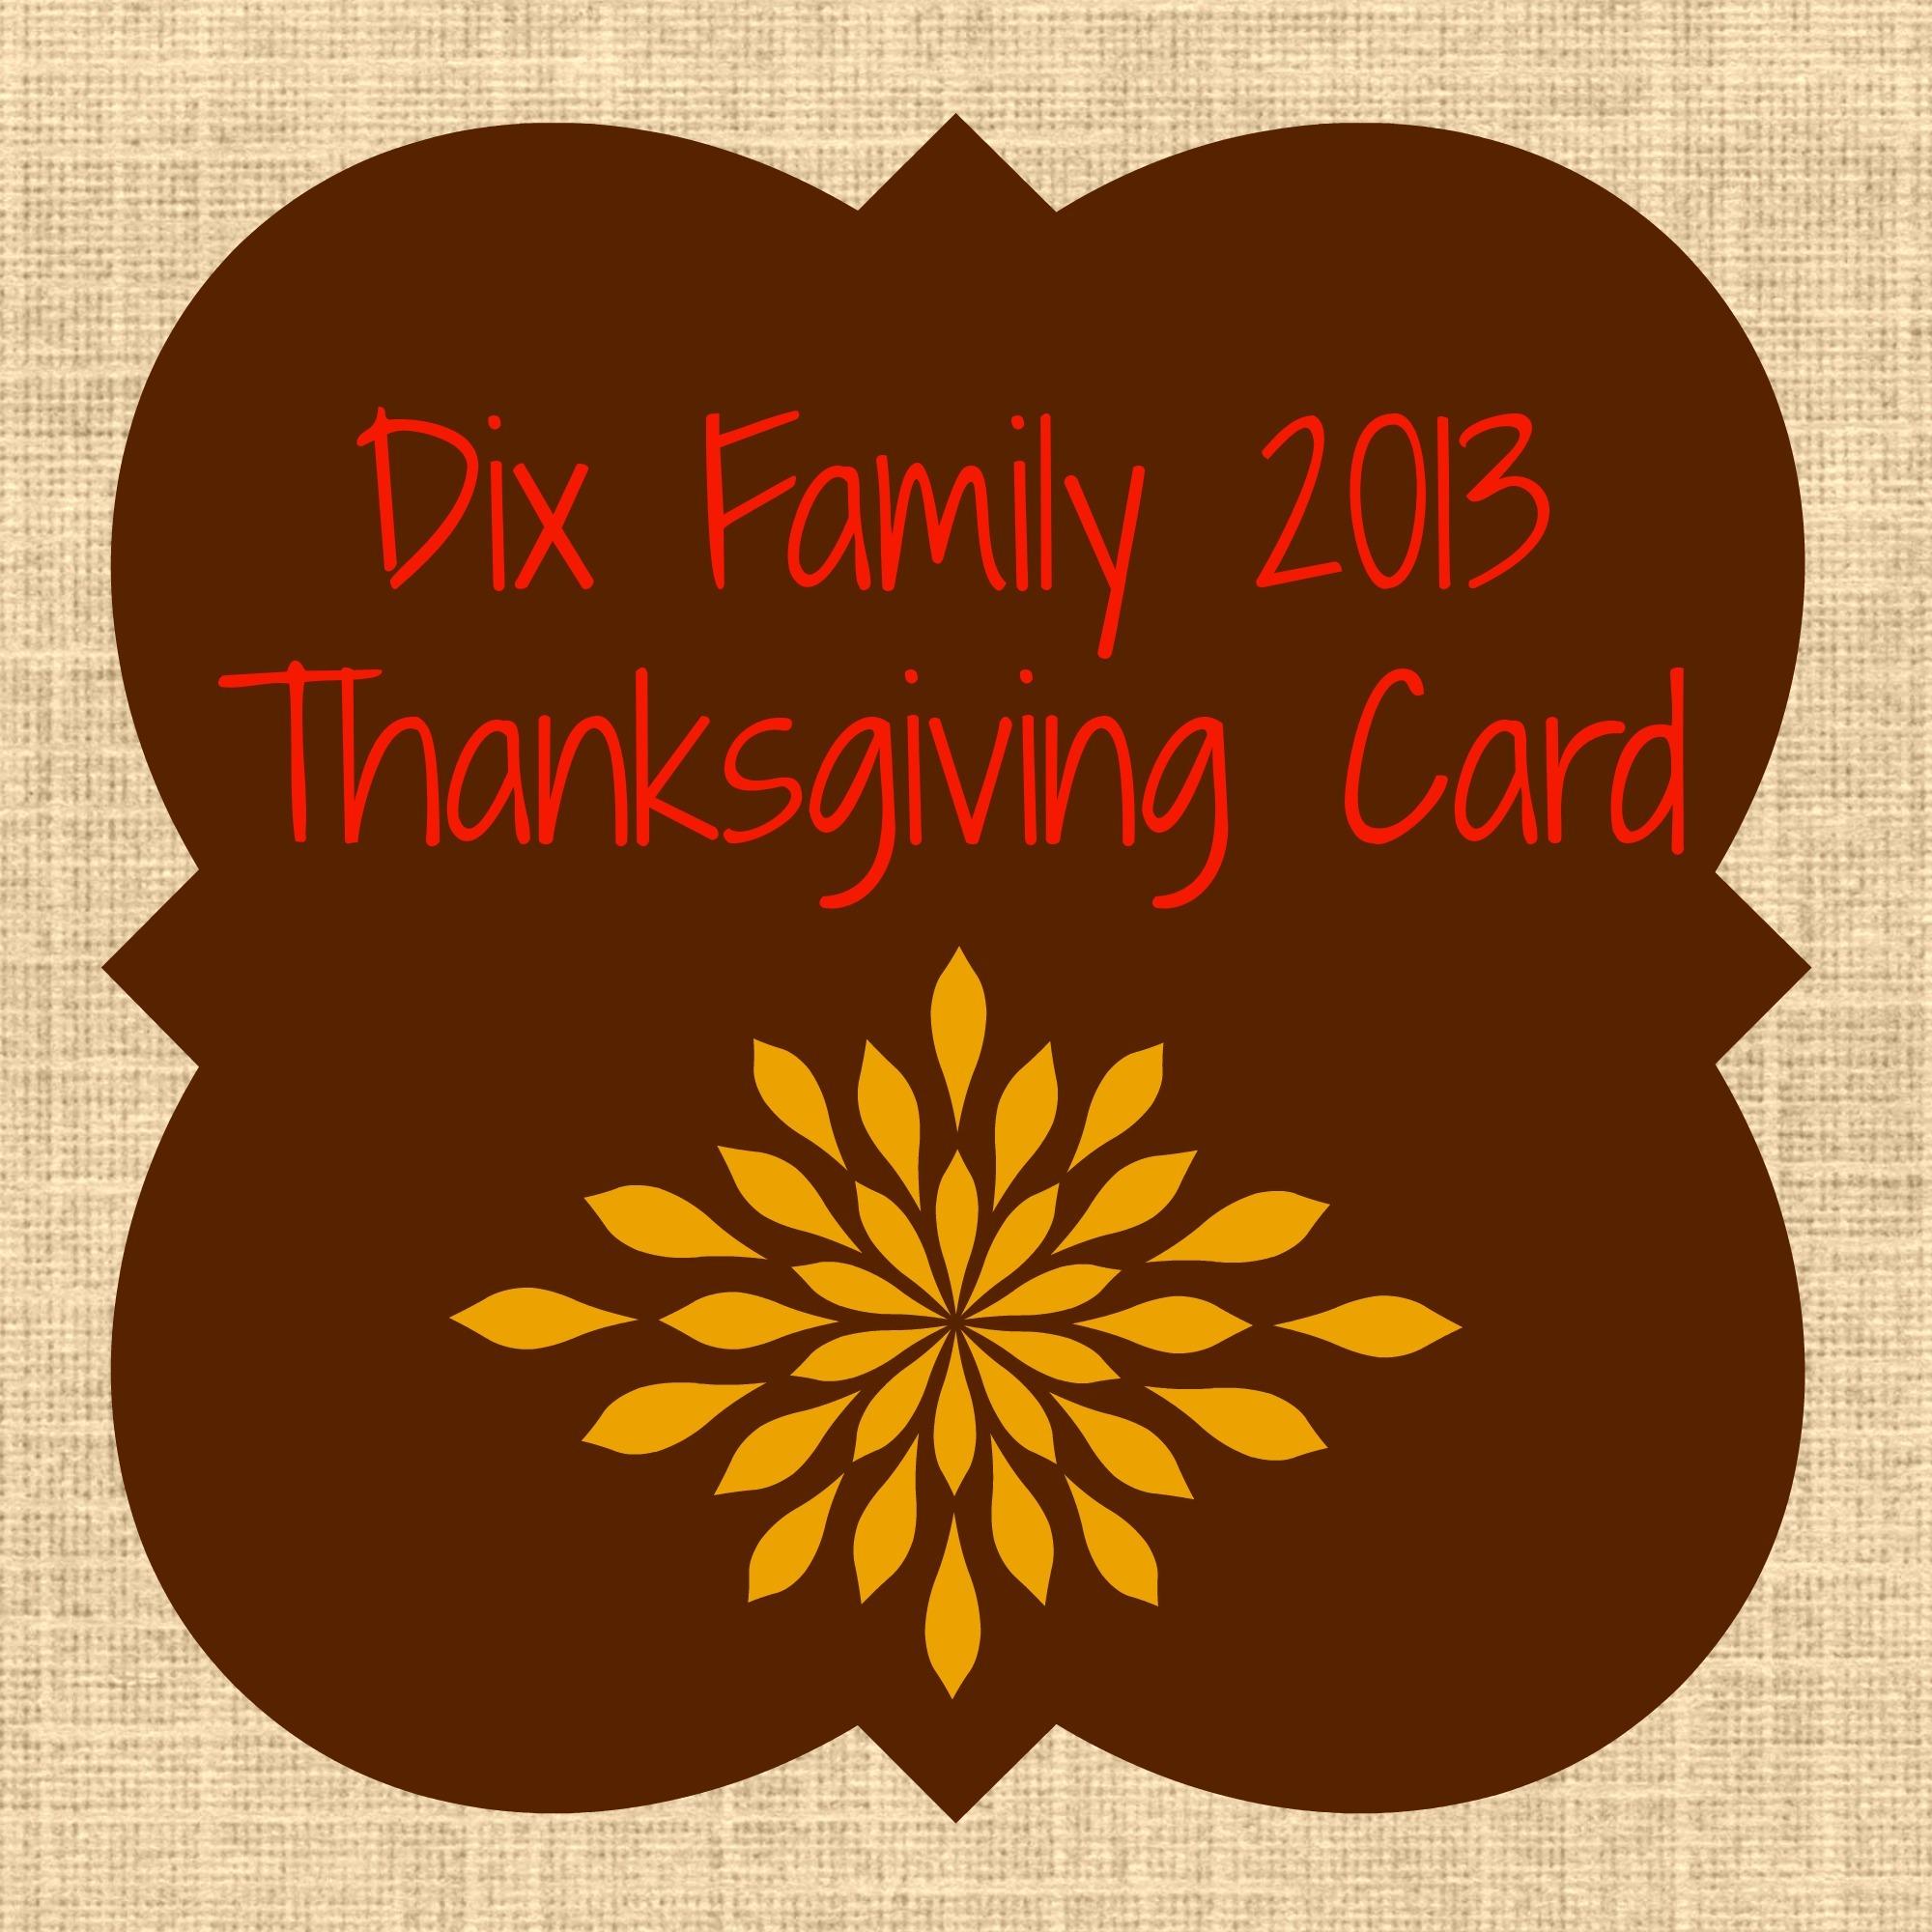 """My Dad daid on faiday""  // Dix Family 2013 Thanksgiving Card"